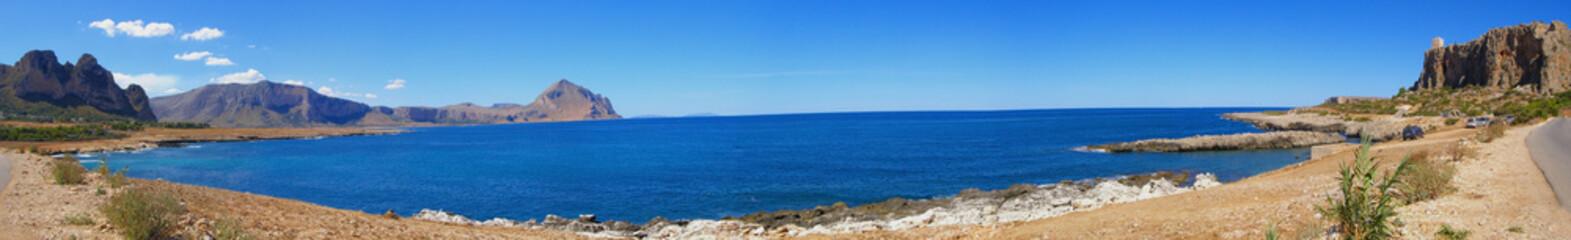 Sicily panorama (Italy)